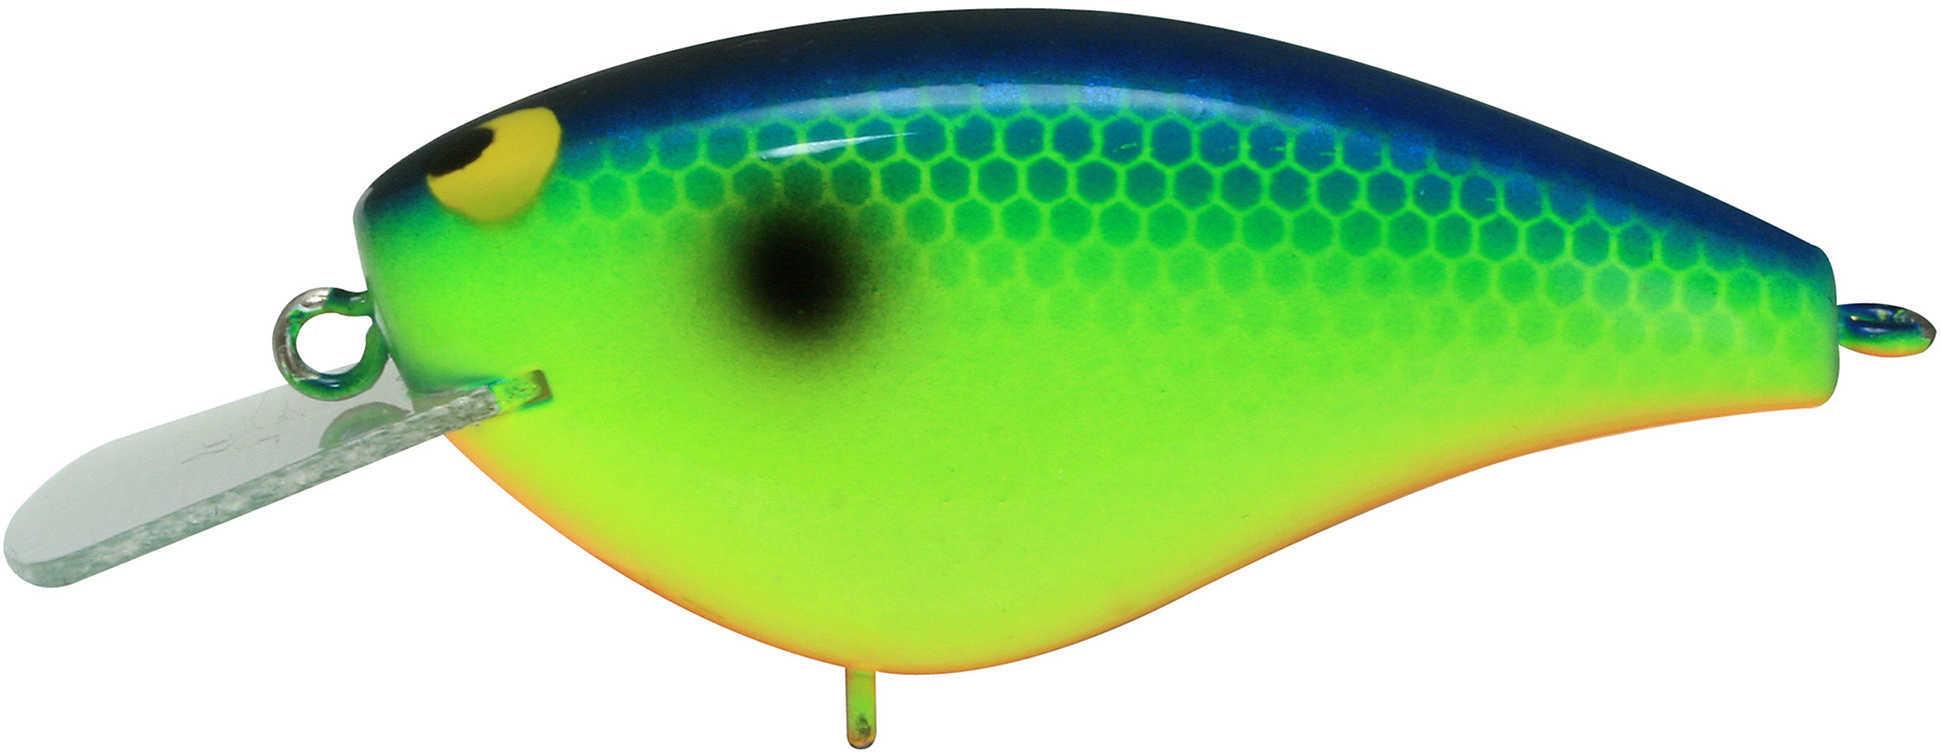 "Jackall Lures Bling 55 Hard Crank Bait Lure 2.20"" Body Length, 4' Depth, 3/8 oz, Blueback Chartreuse, Per 1 Md: JBLG55-B"